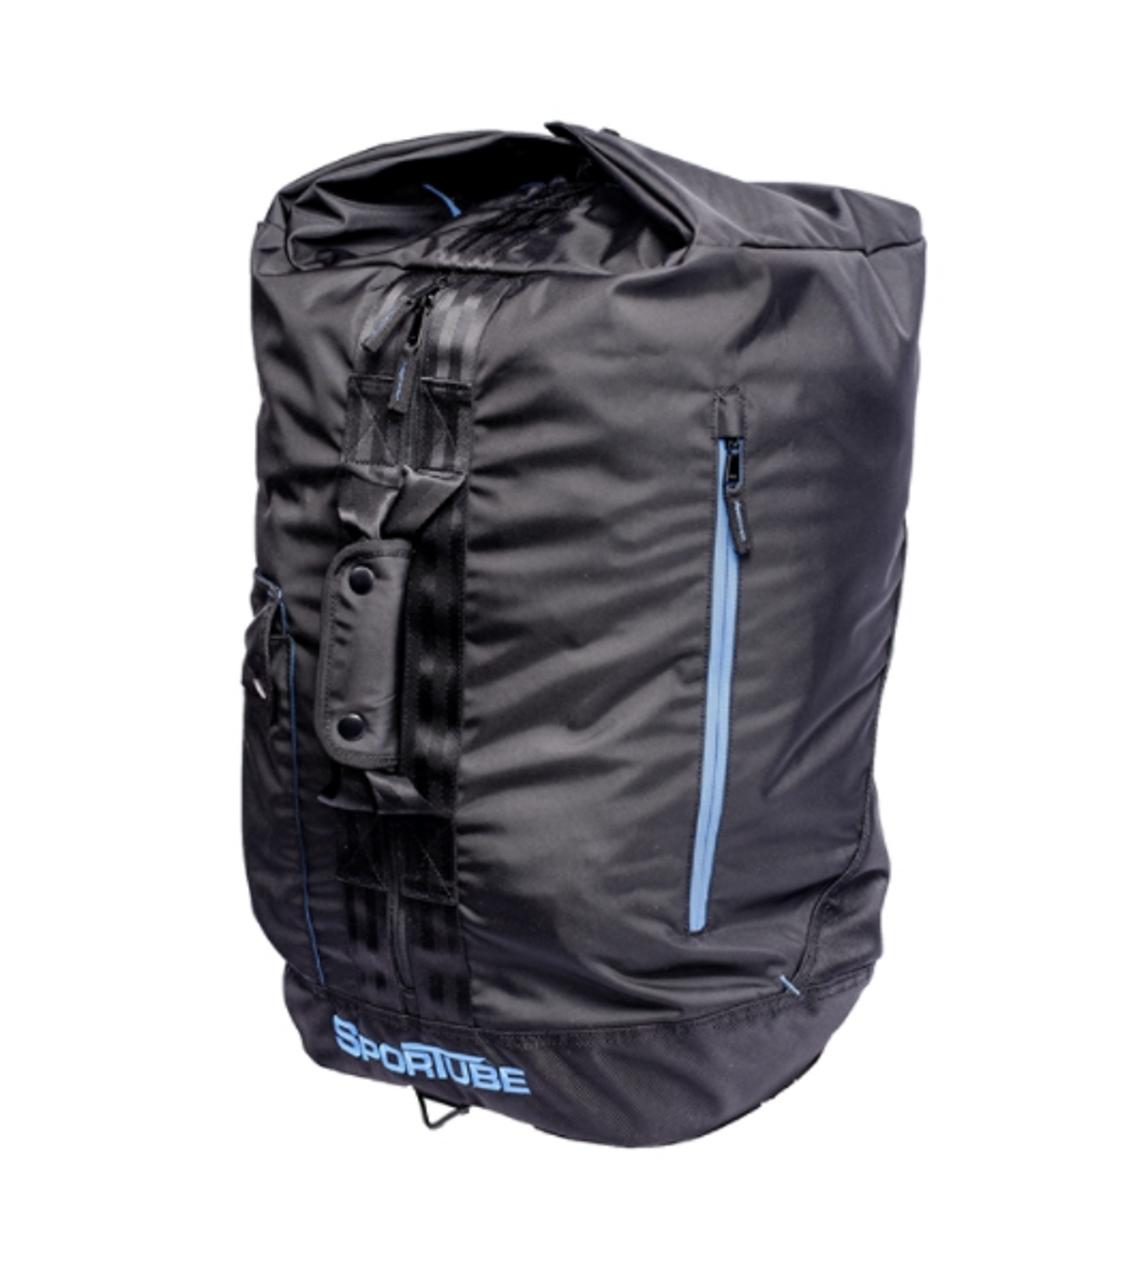 Overnighter Gear Duffle Bag | SporTube